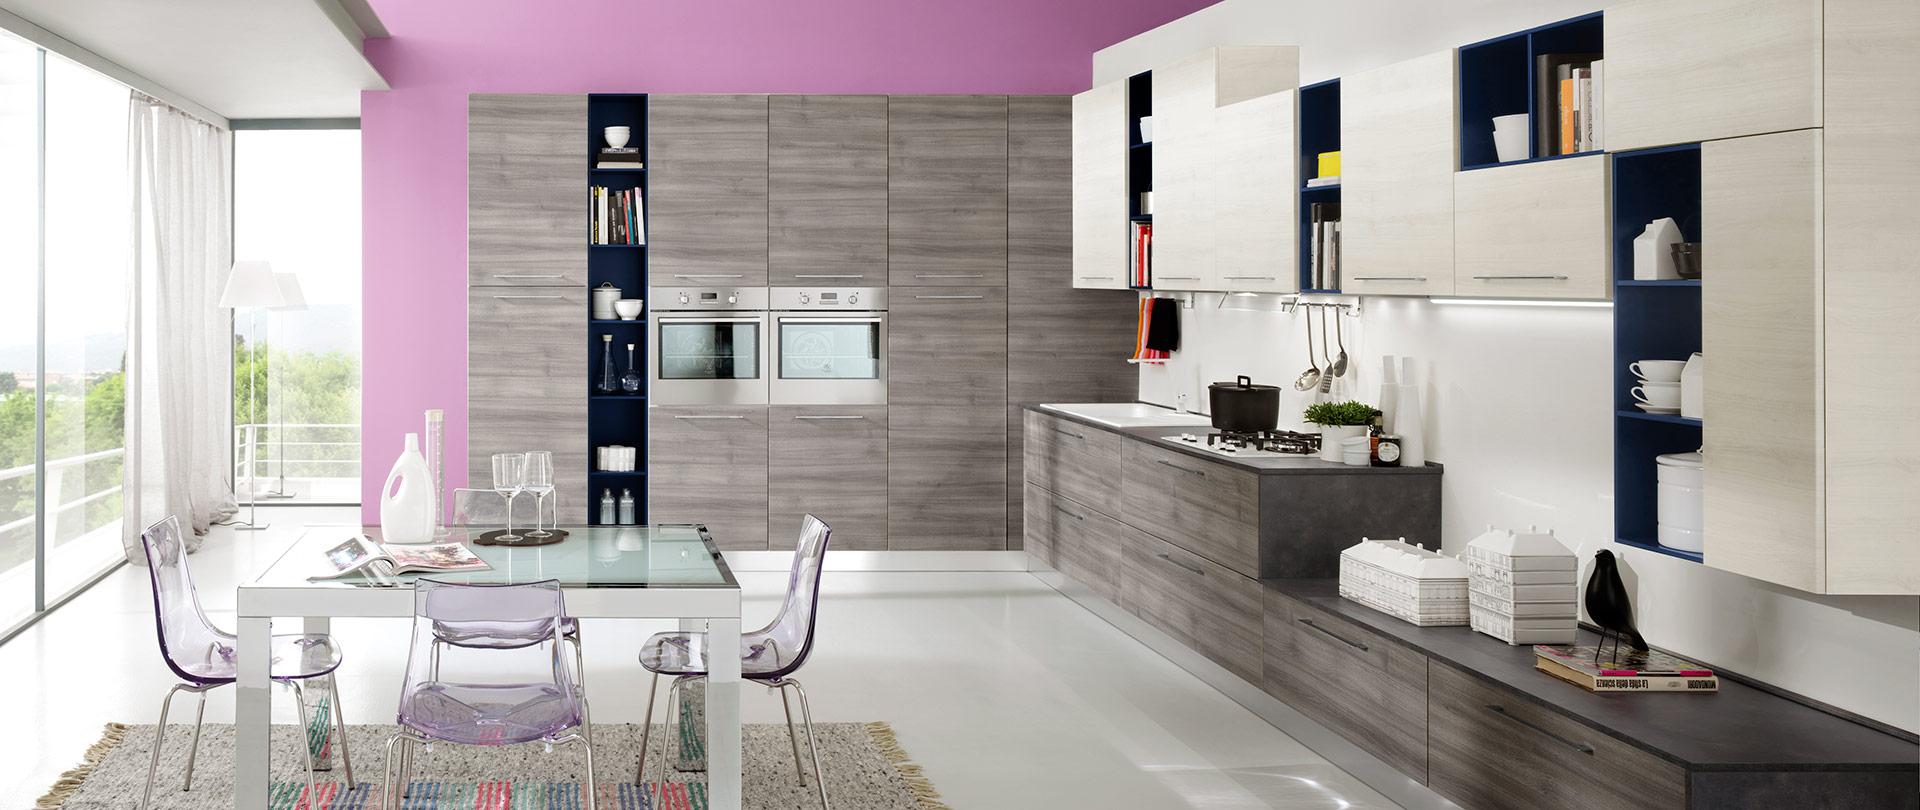 Piastrelle per cucina bianca lucida finest cucina bianca e grigia lucida con microonde a - Piastrella bianca lucida ...